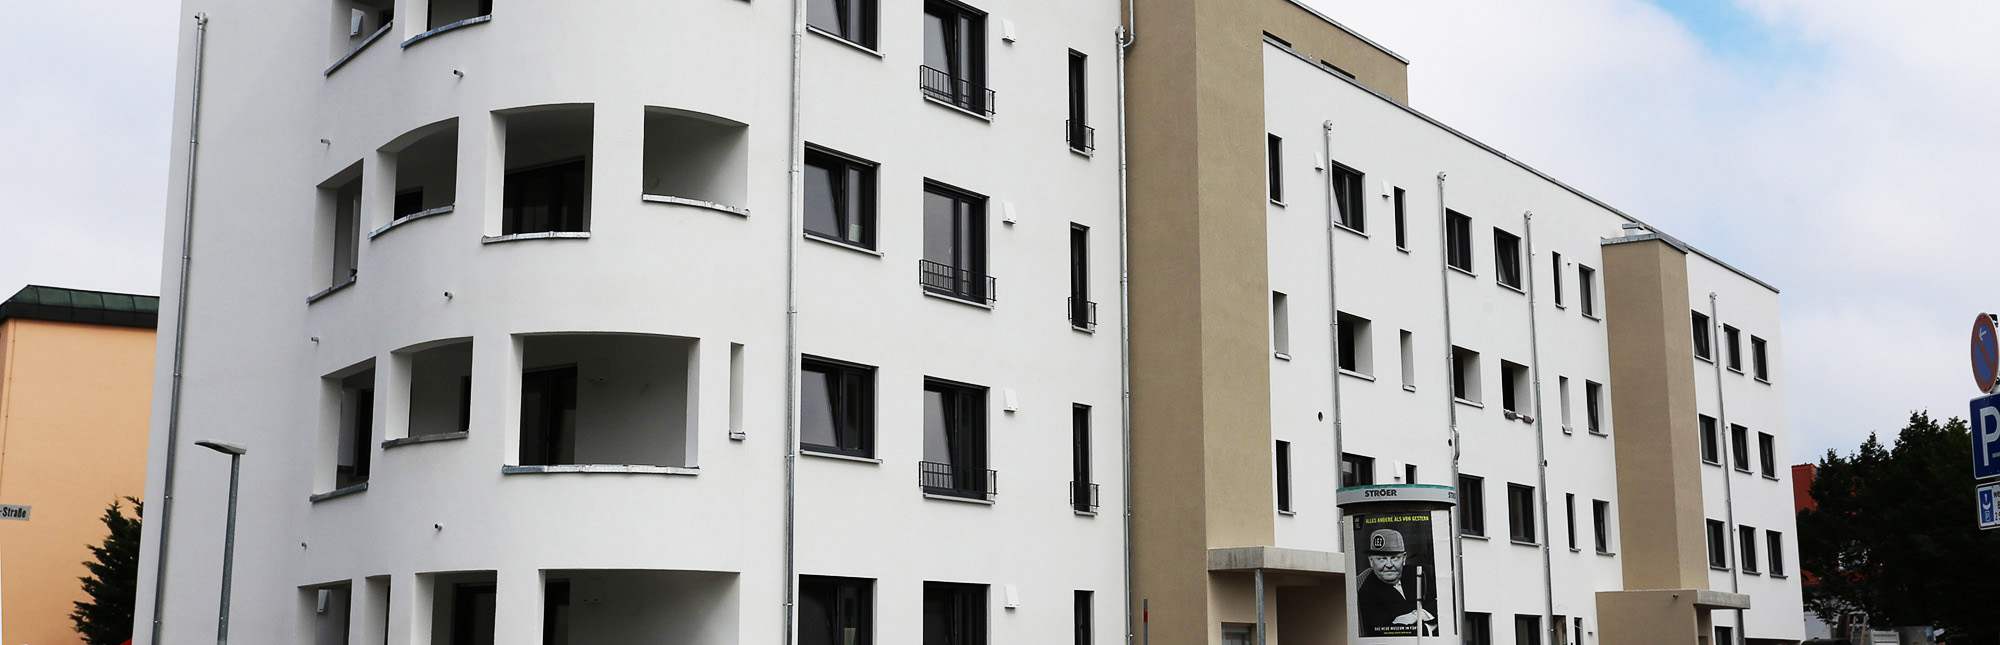 Bamberg – Friedrich-Ebert-Strasse 11